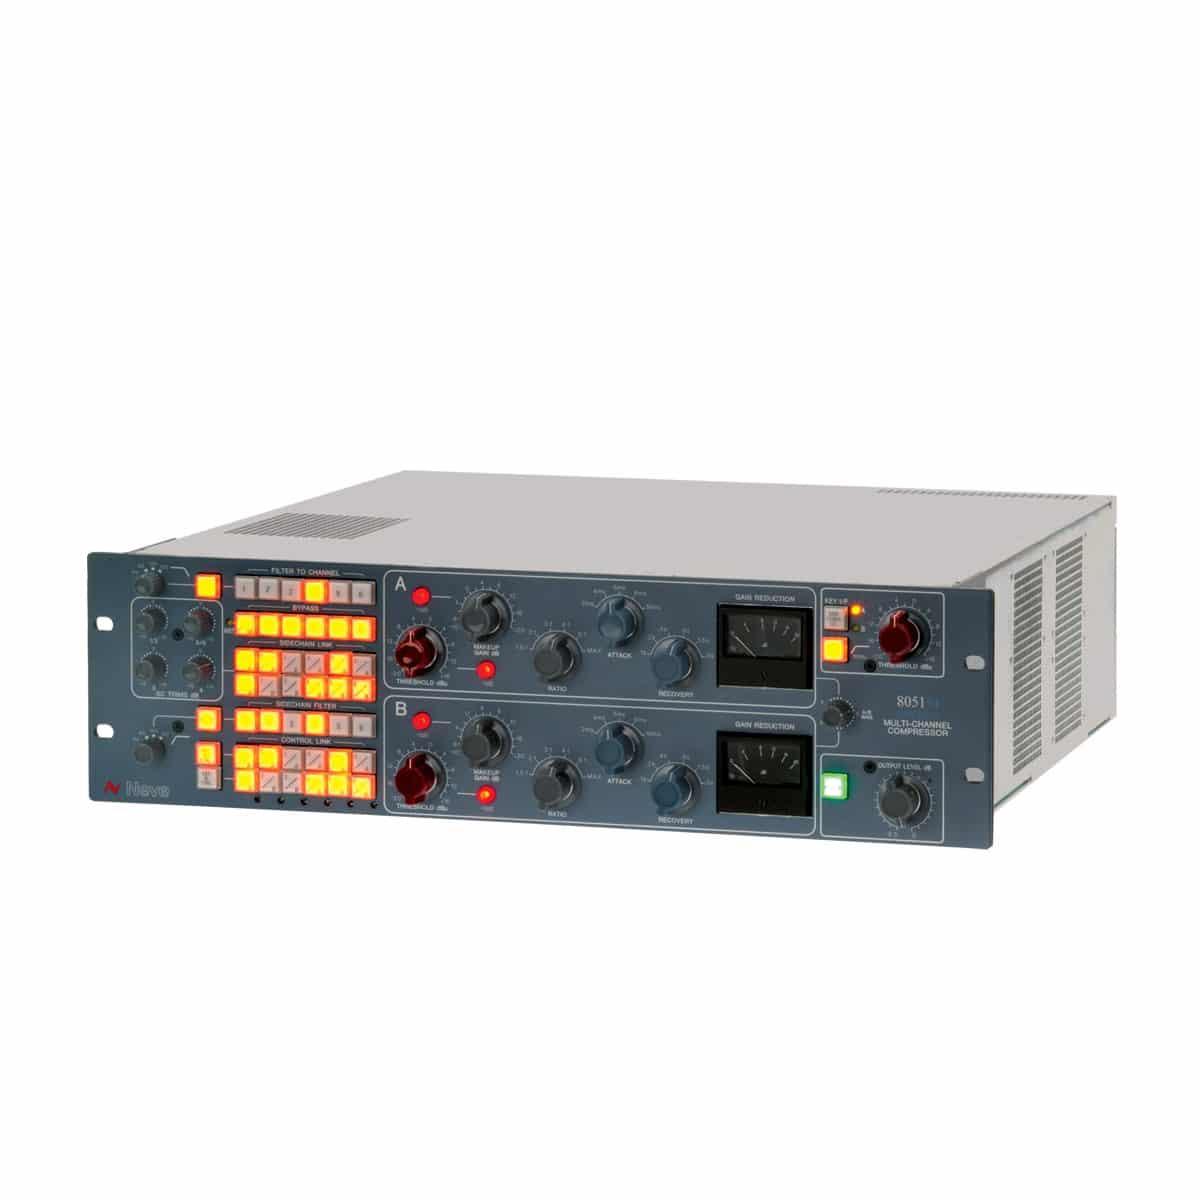 Ams Neve 8051 03 Pro Audio, Outboard, Compressori